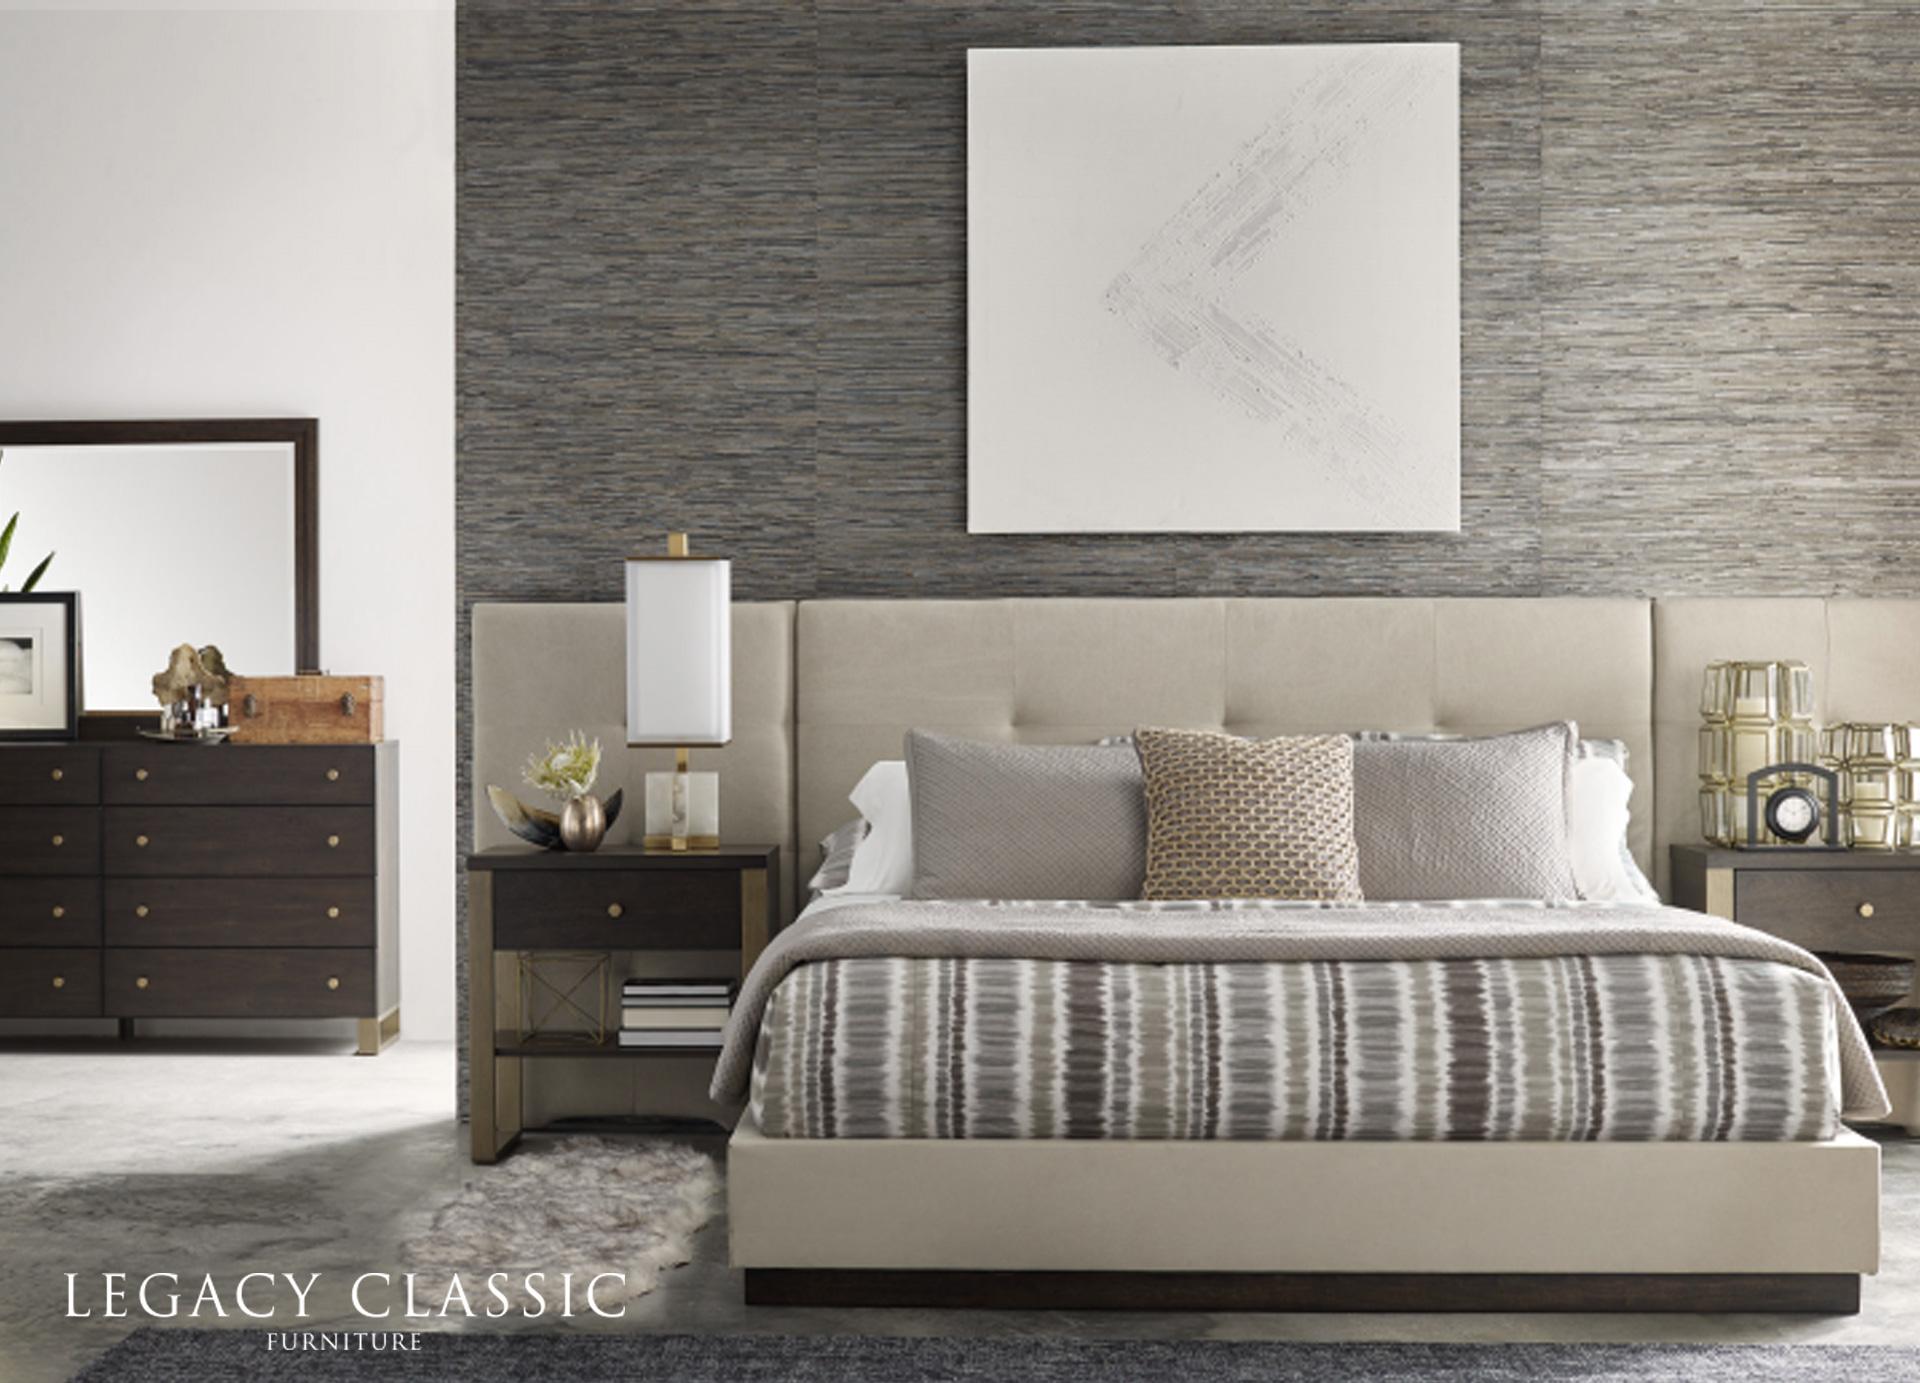 central-florida-fine-interiors-showroom-legacy-classic-furniture